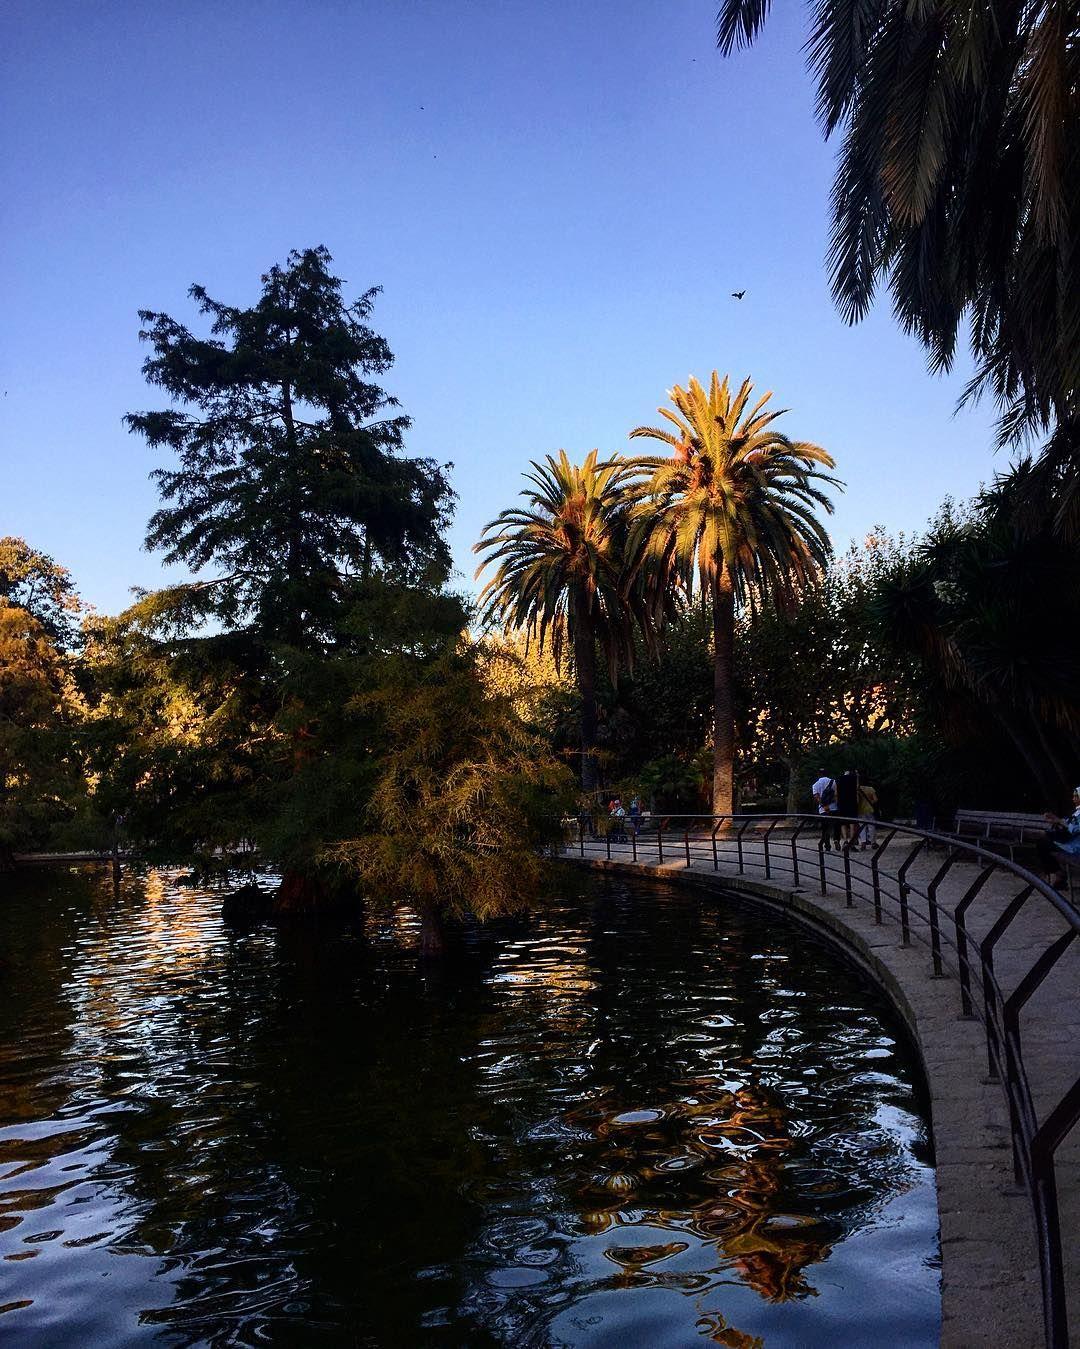 Parc de la Ciutadella - Barcelona